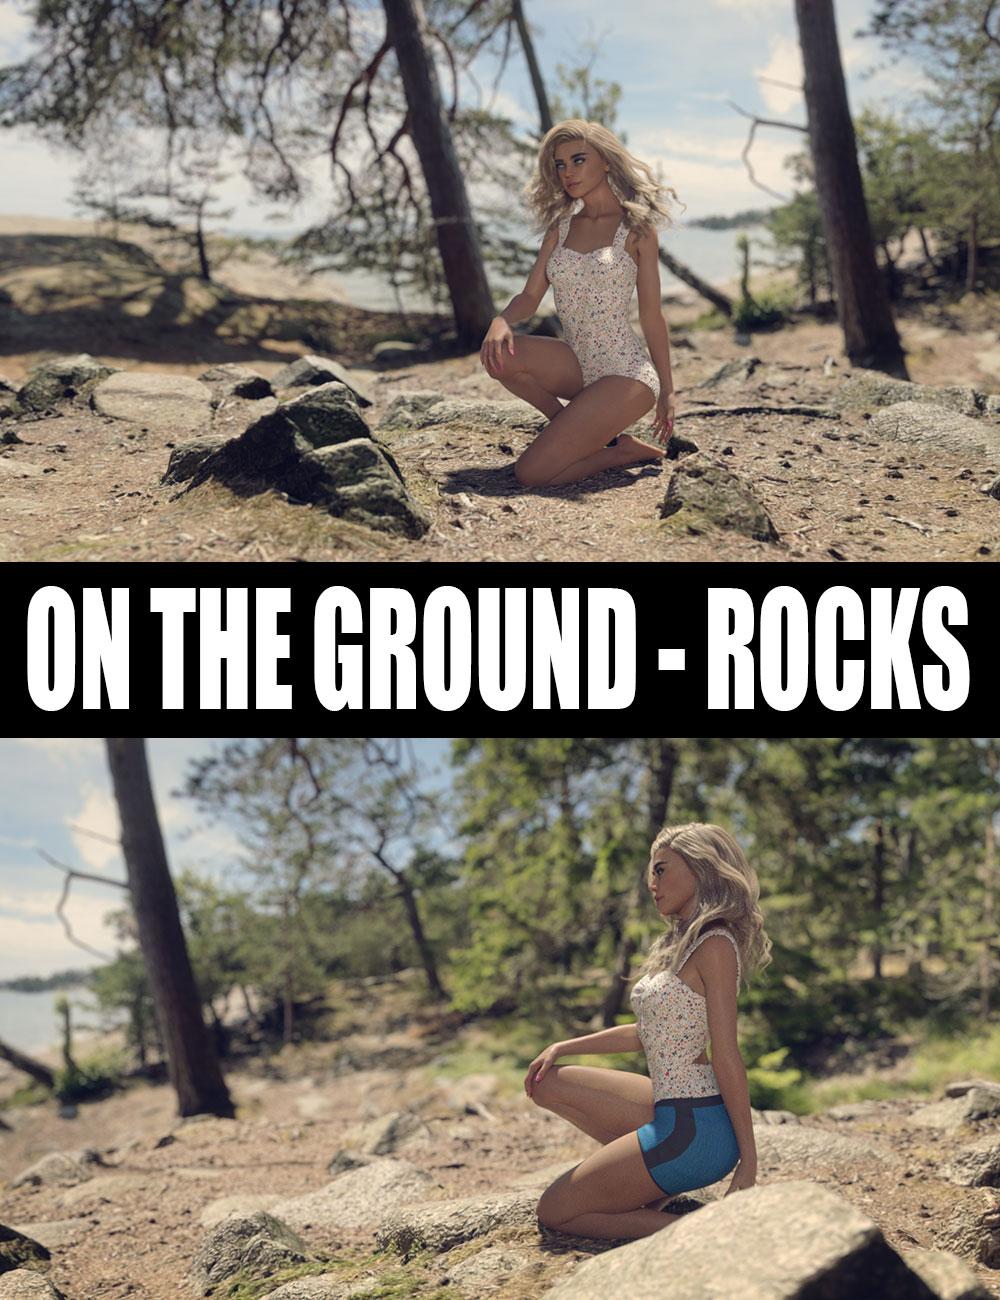 On The Ground - Rocks by: Dreamlight, 3D Models by Daz 3D